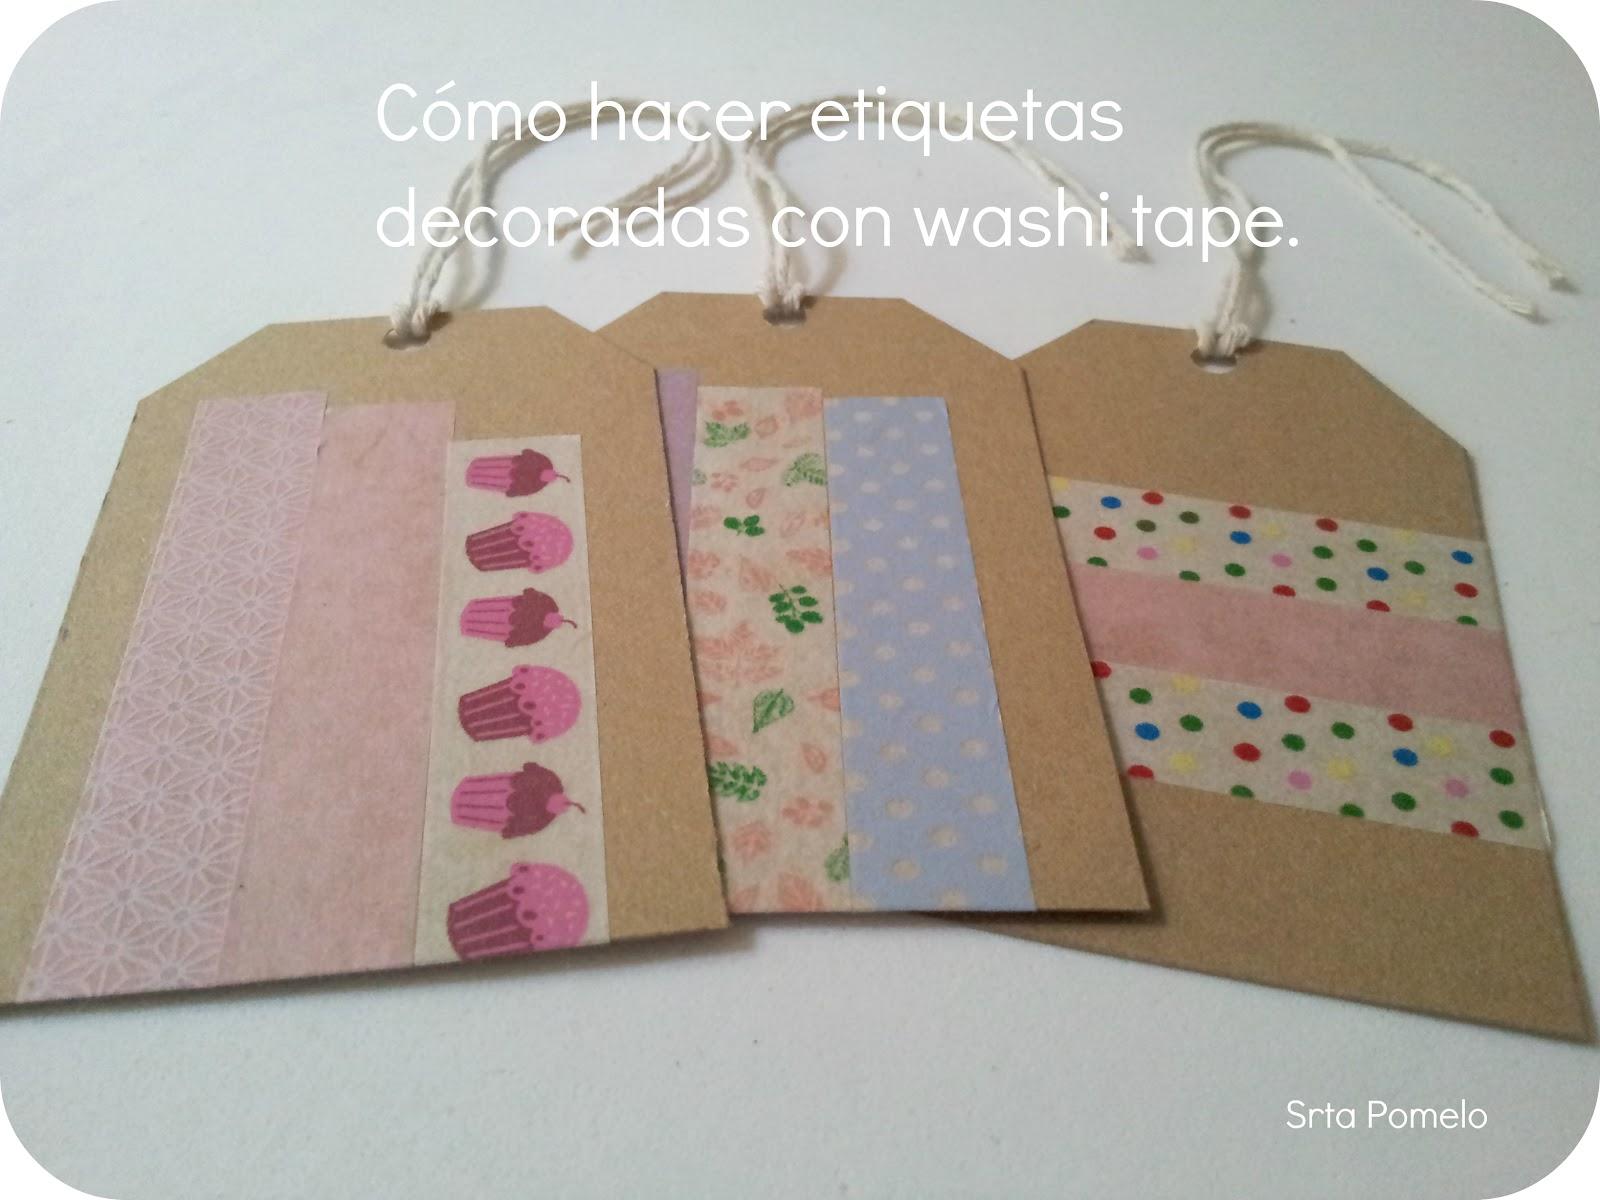 Srta pomelo tutorial c mo hacer etiquetas decoradas con - Como decorar con washi tape ...